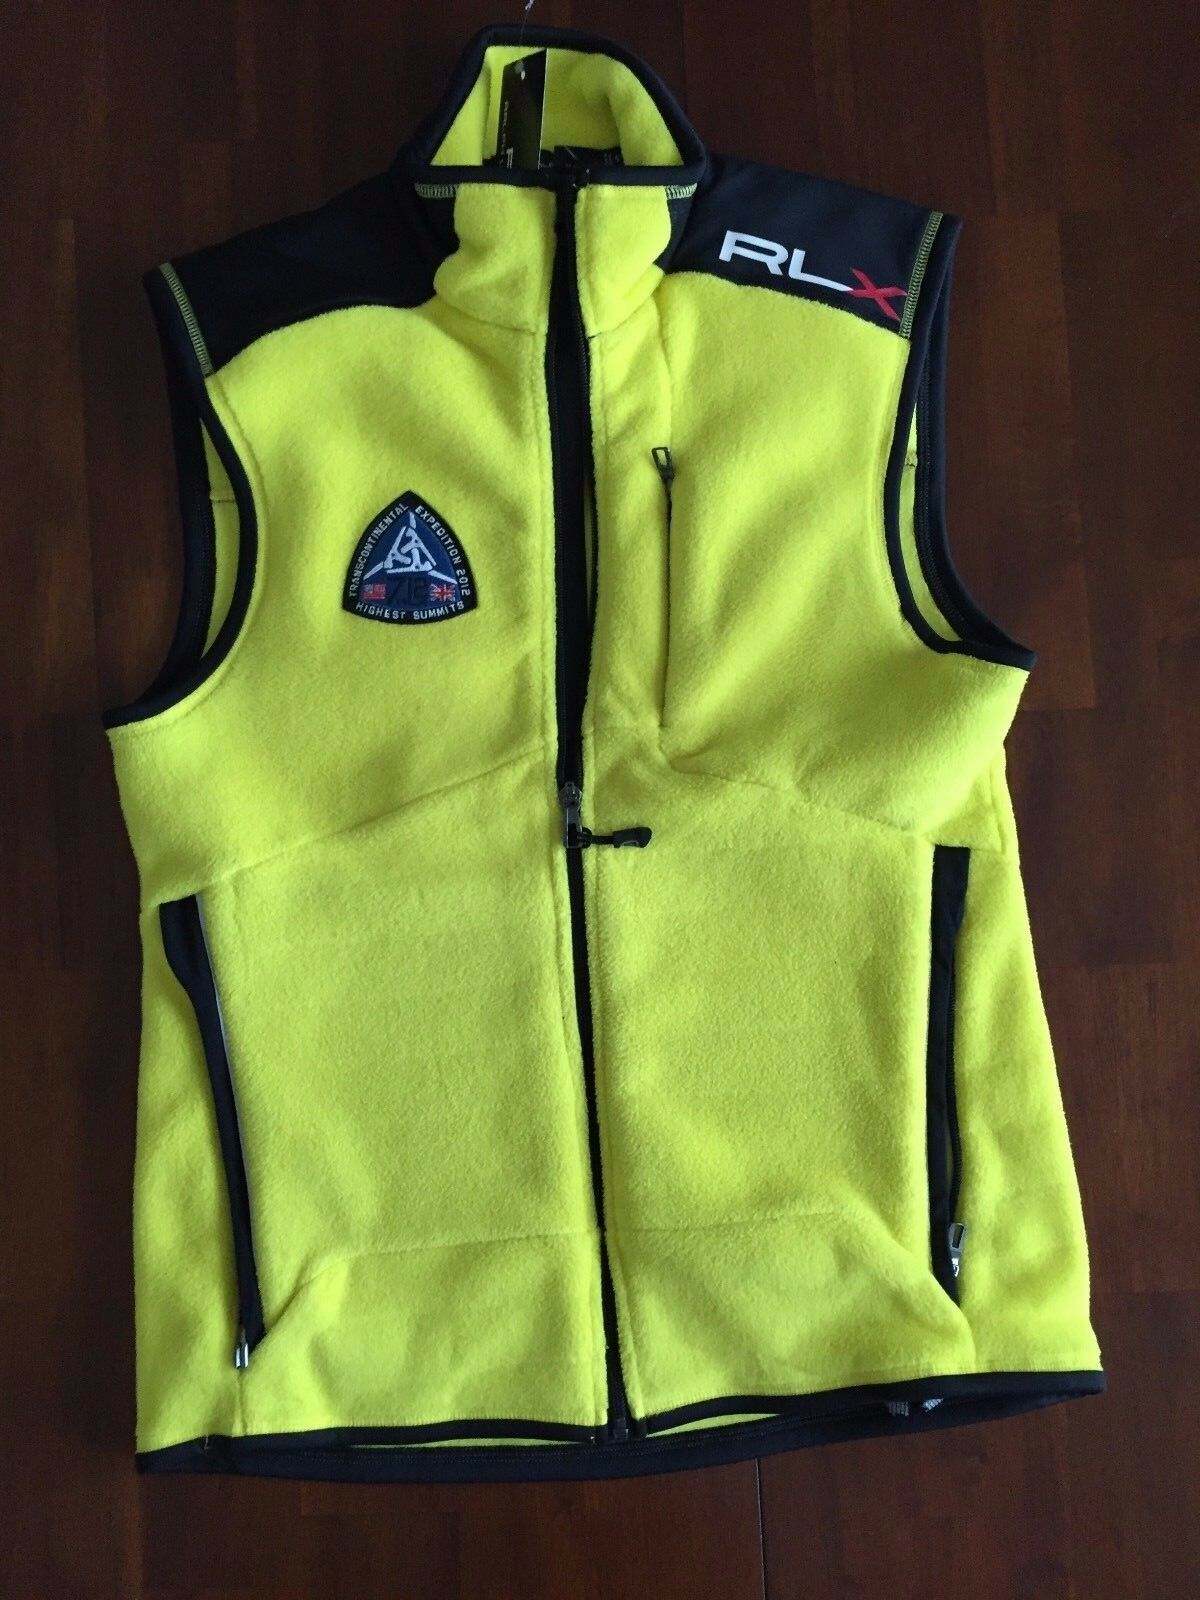 RLX Ralph Lauren  Transcontinental Expedition 2012 Fleece Vest ( Small ) 165